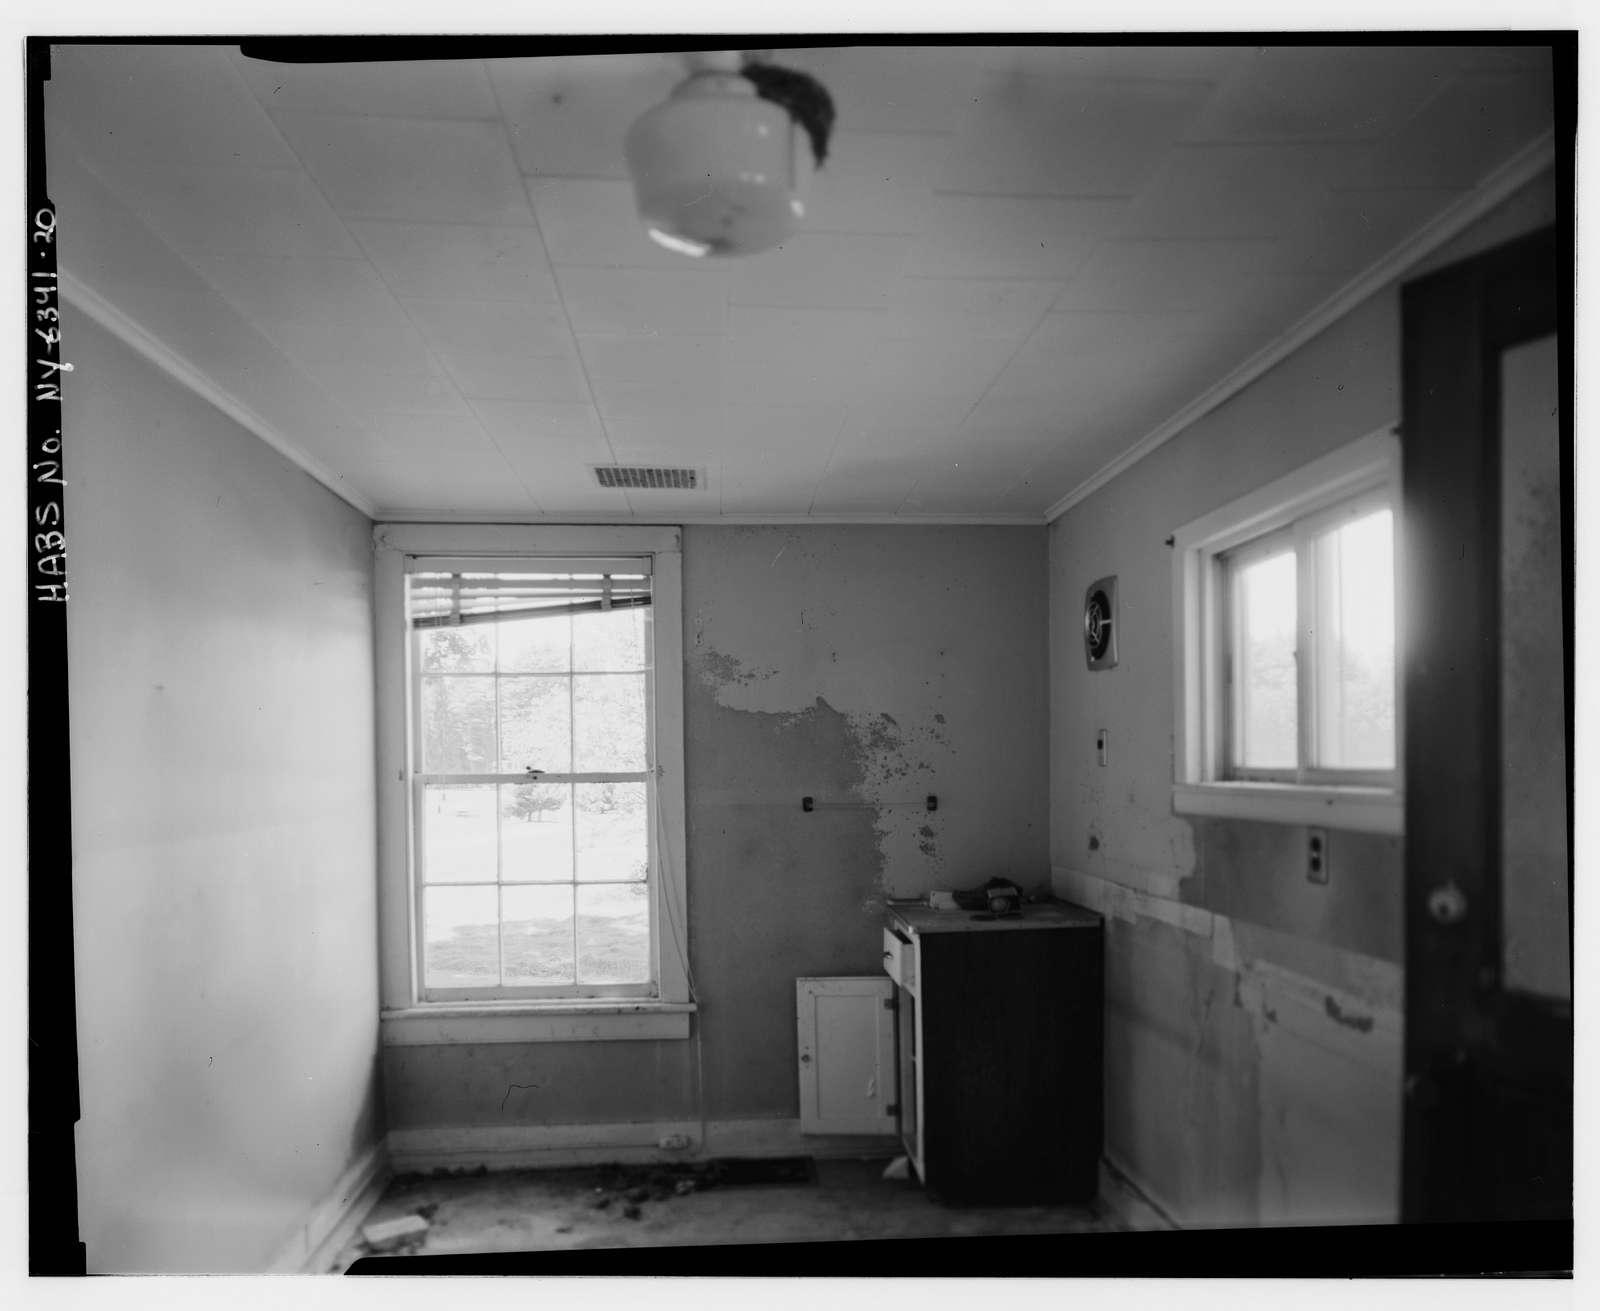 Patrick House, Spa State Park, .75 mile southeast of Gideon Putnam Hotel, Saratoga Springs, Saratoga County, NY